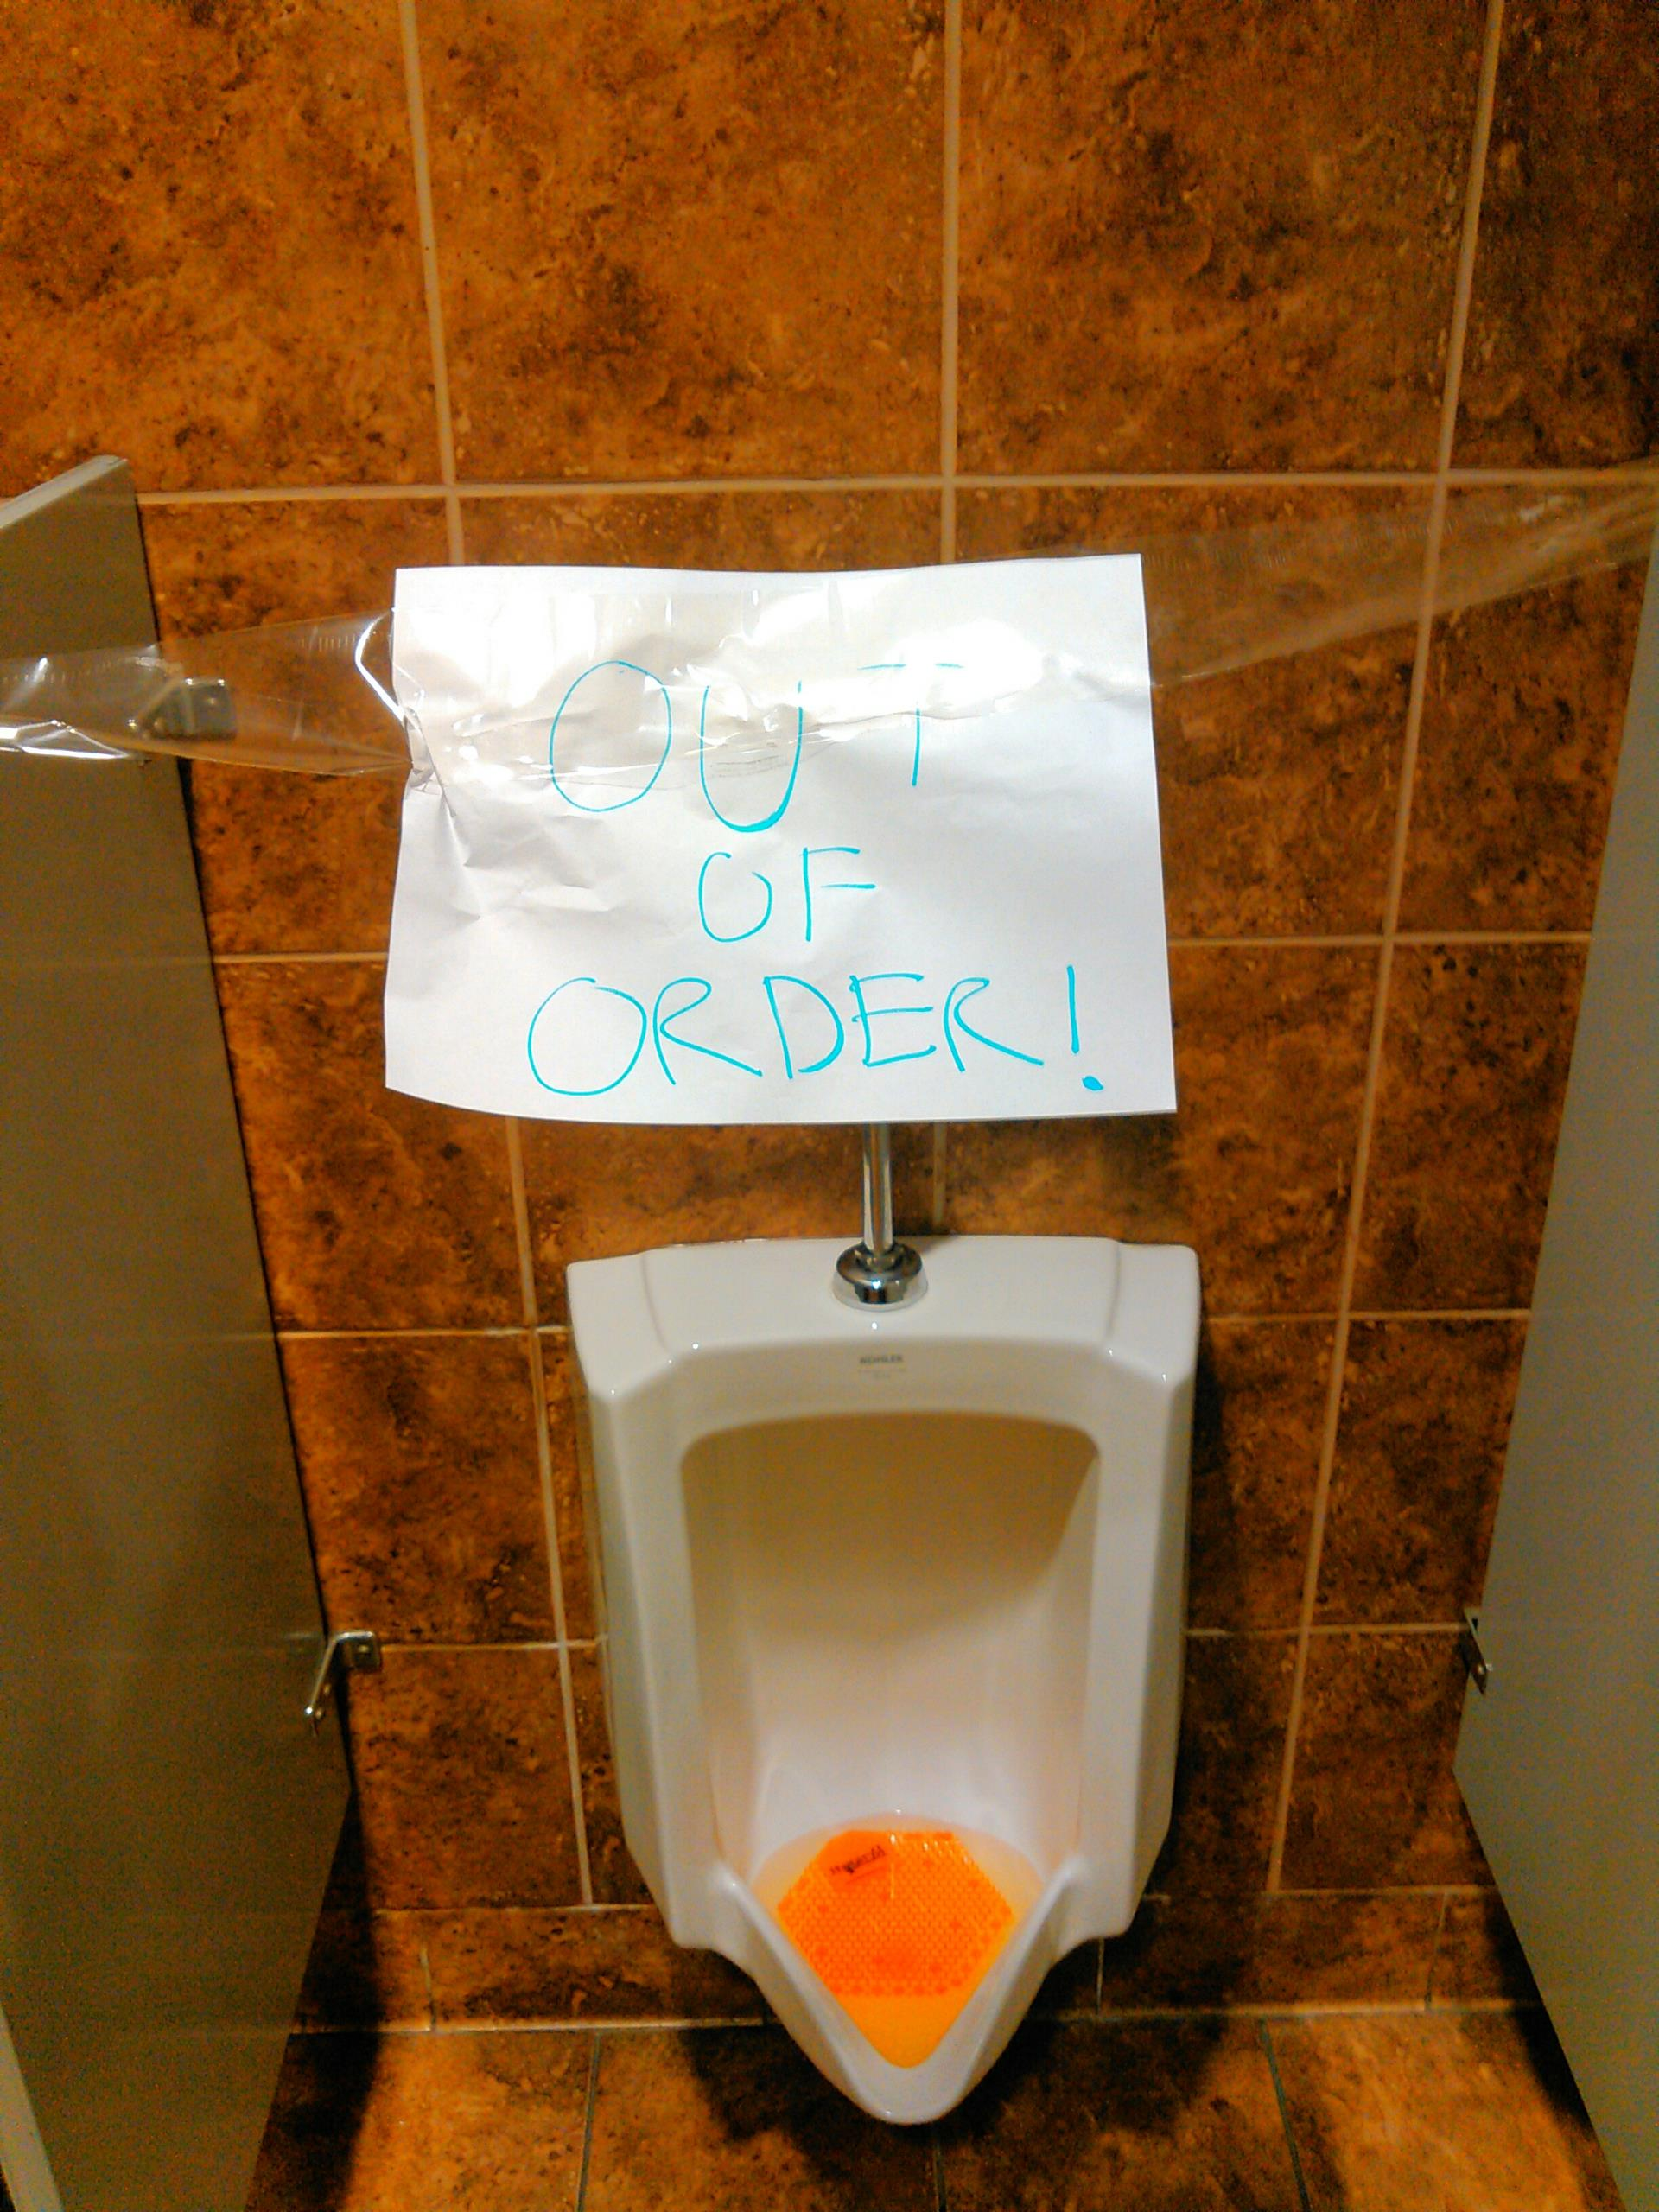 Pomona, CA - Urinal stoppage